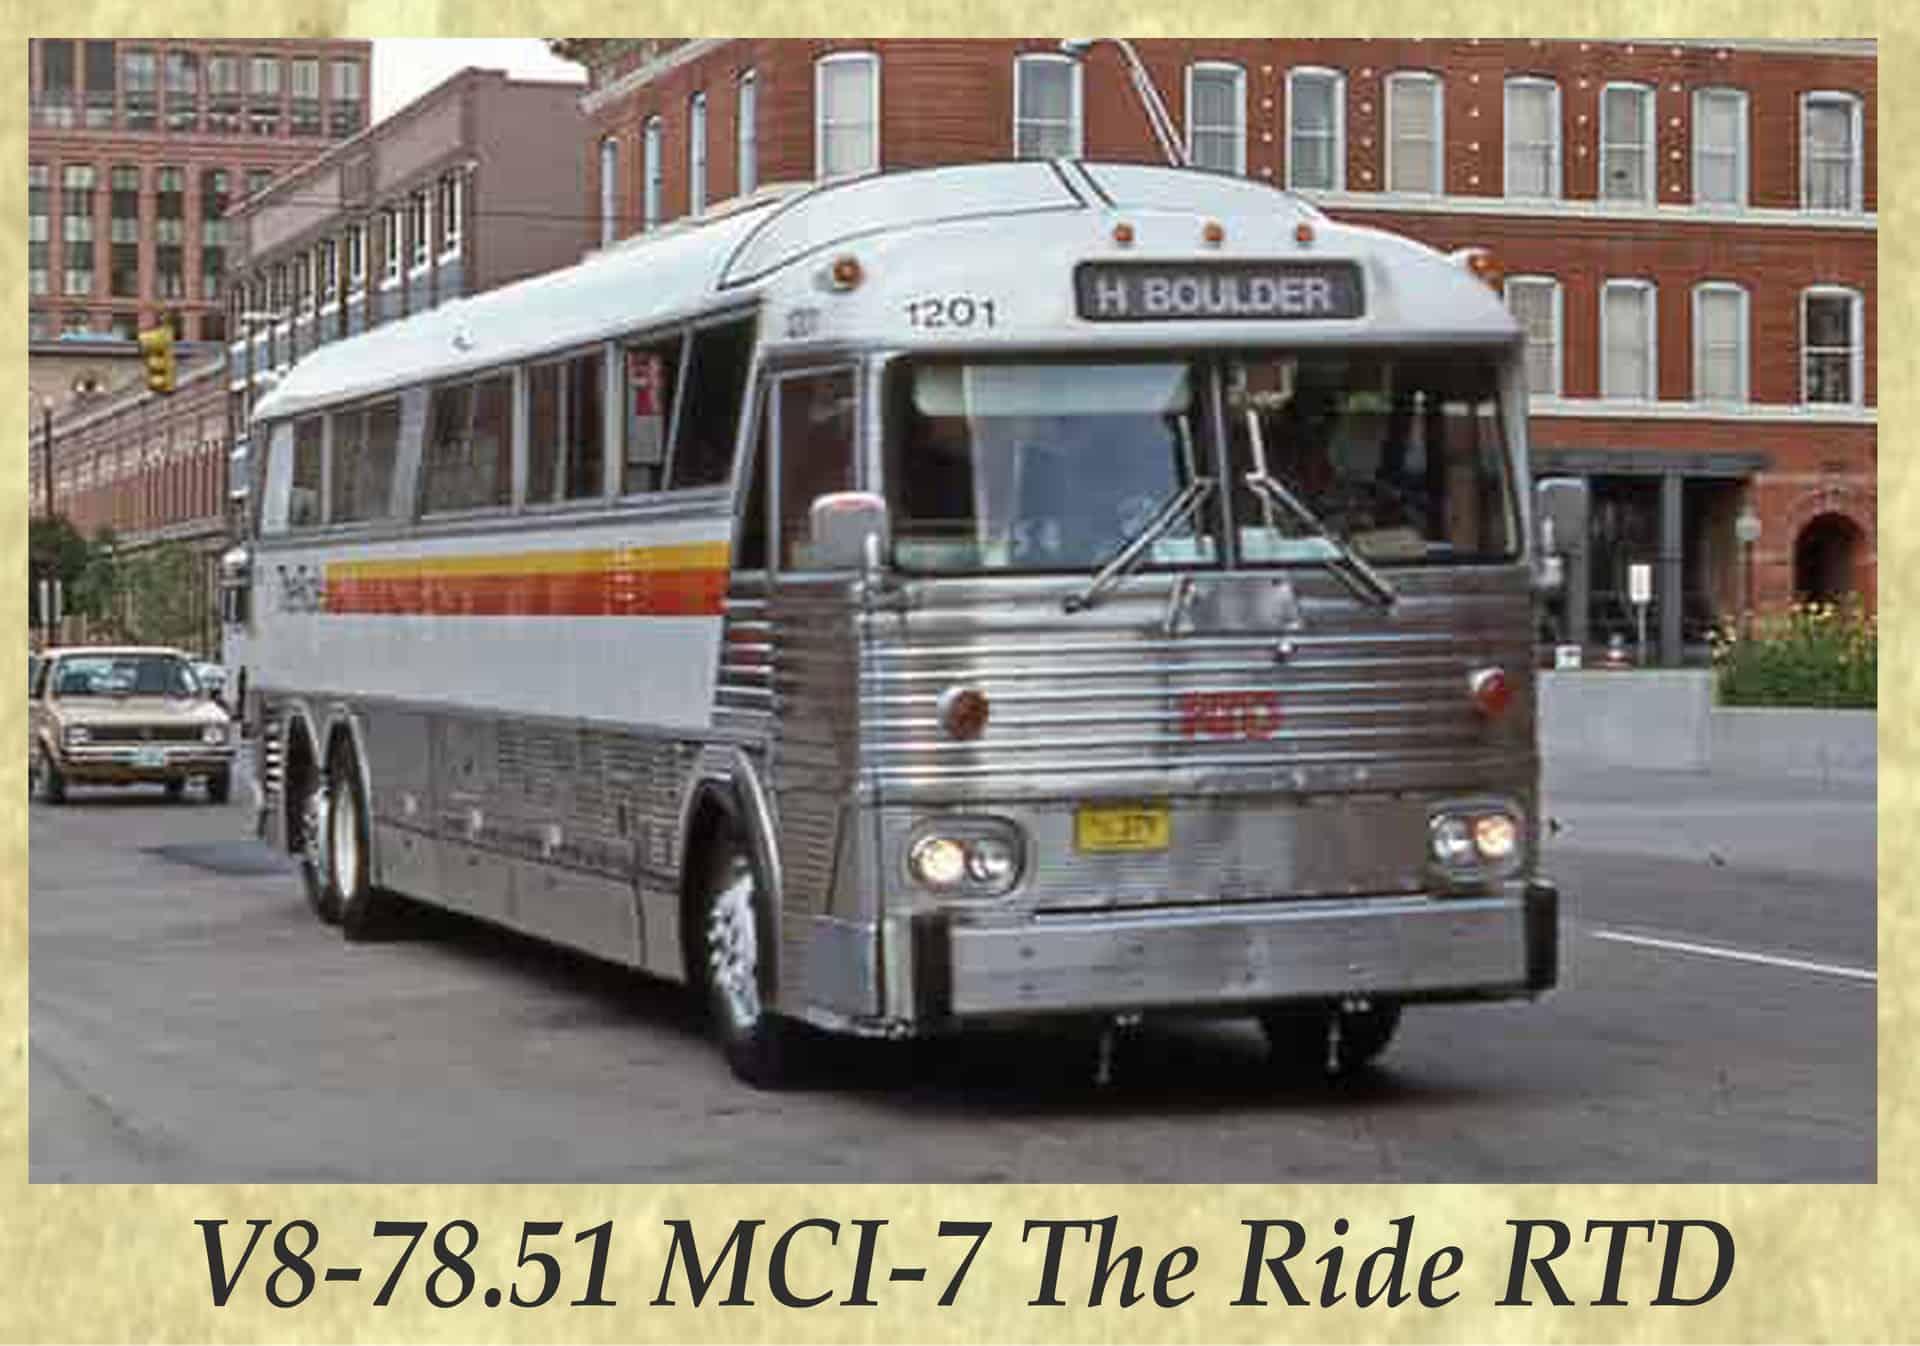 V8-78.51 MCI-7 The Ride RTD